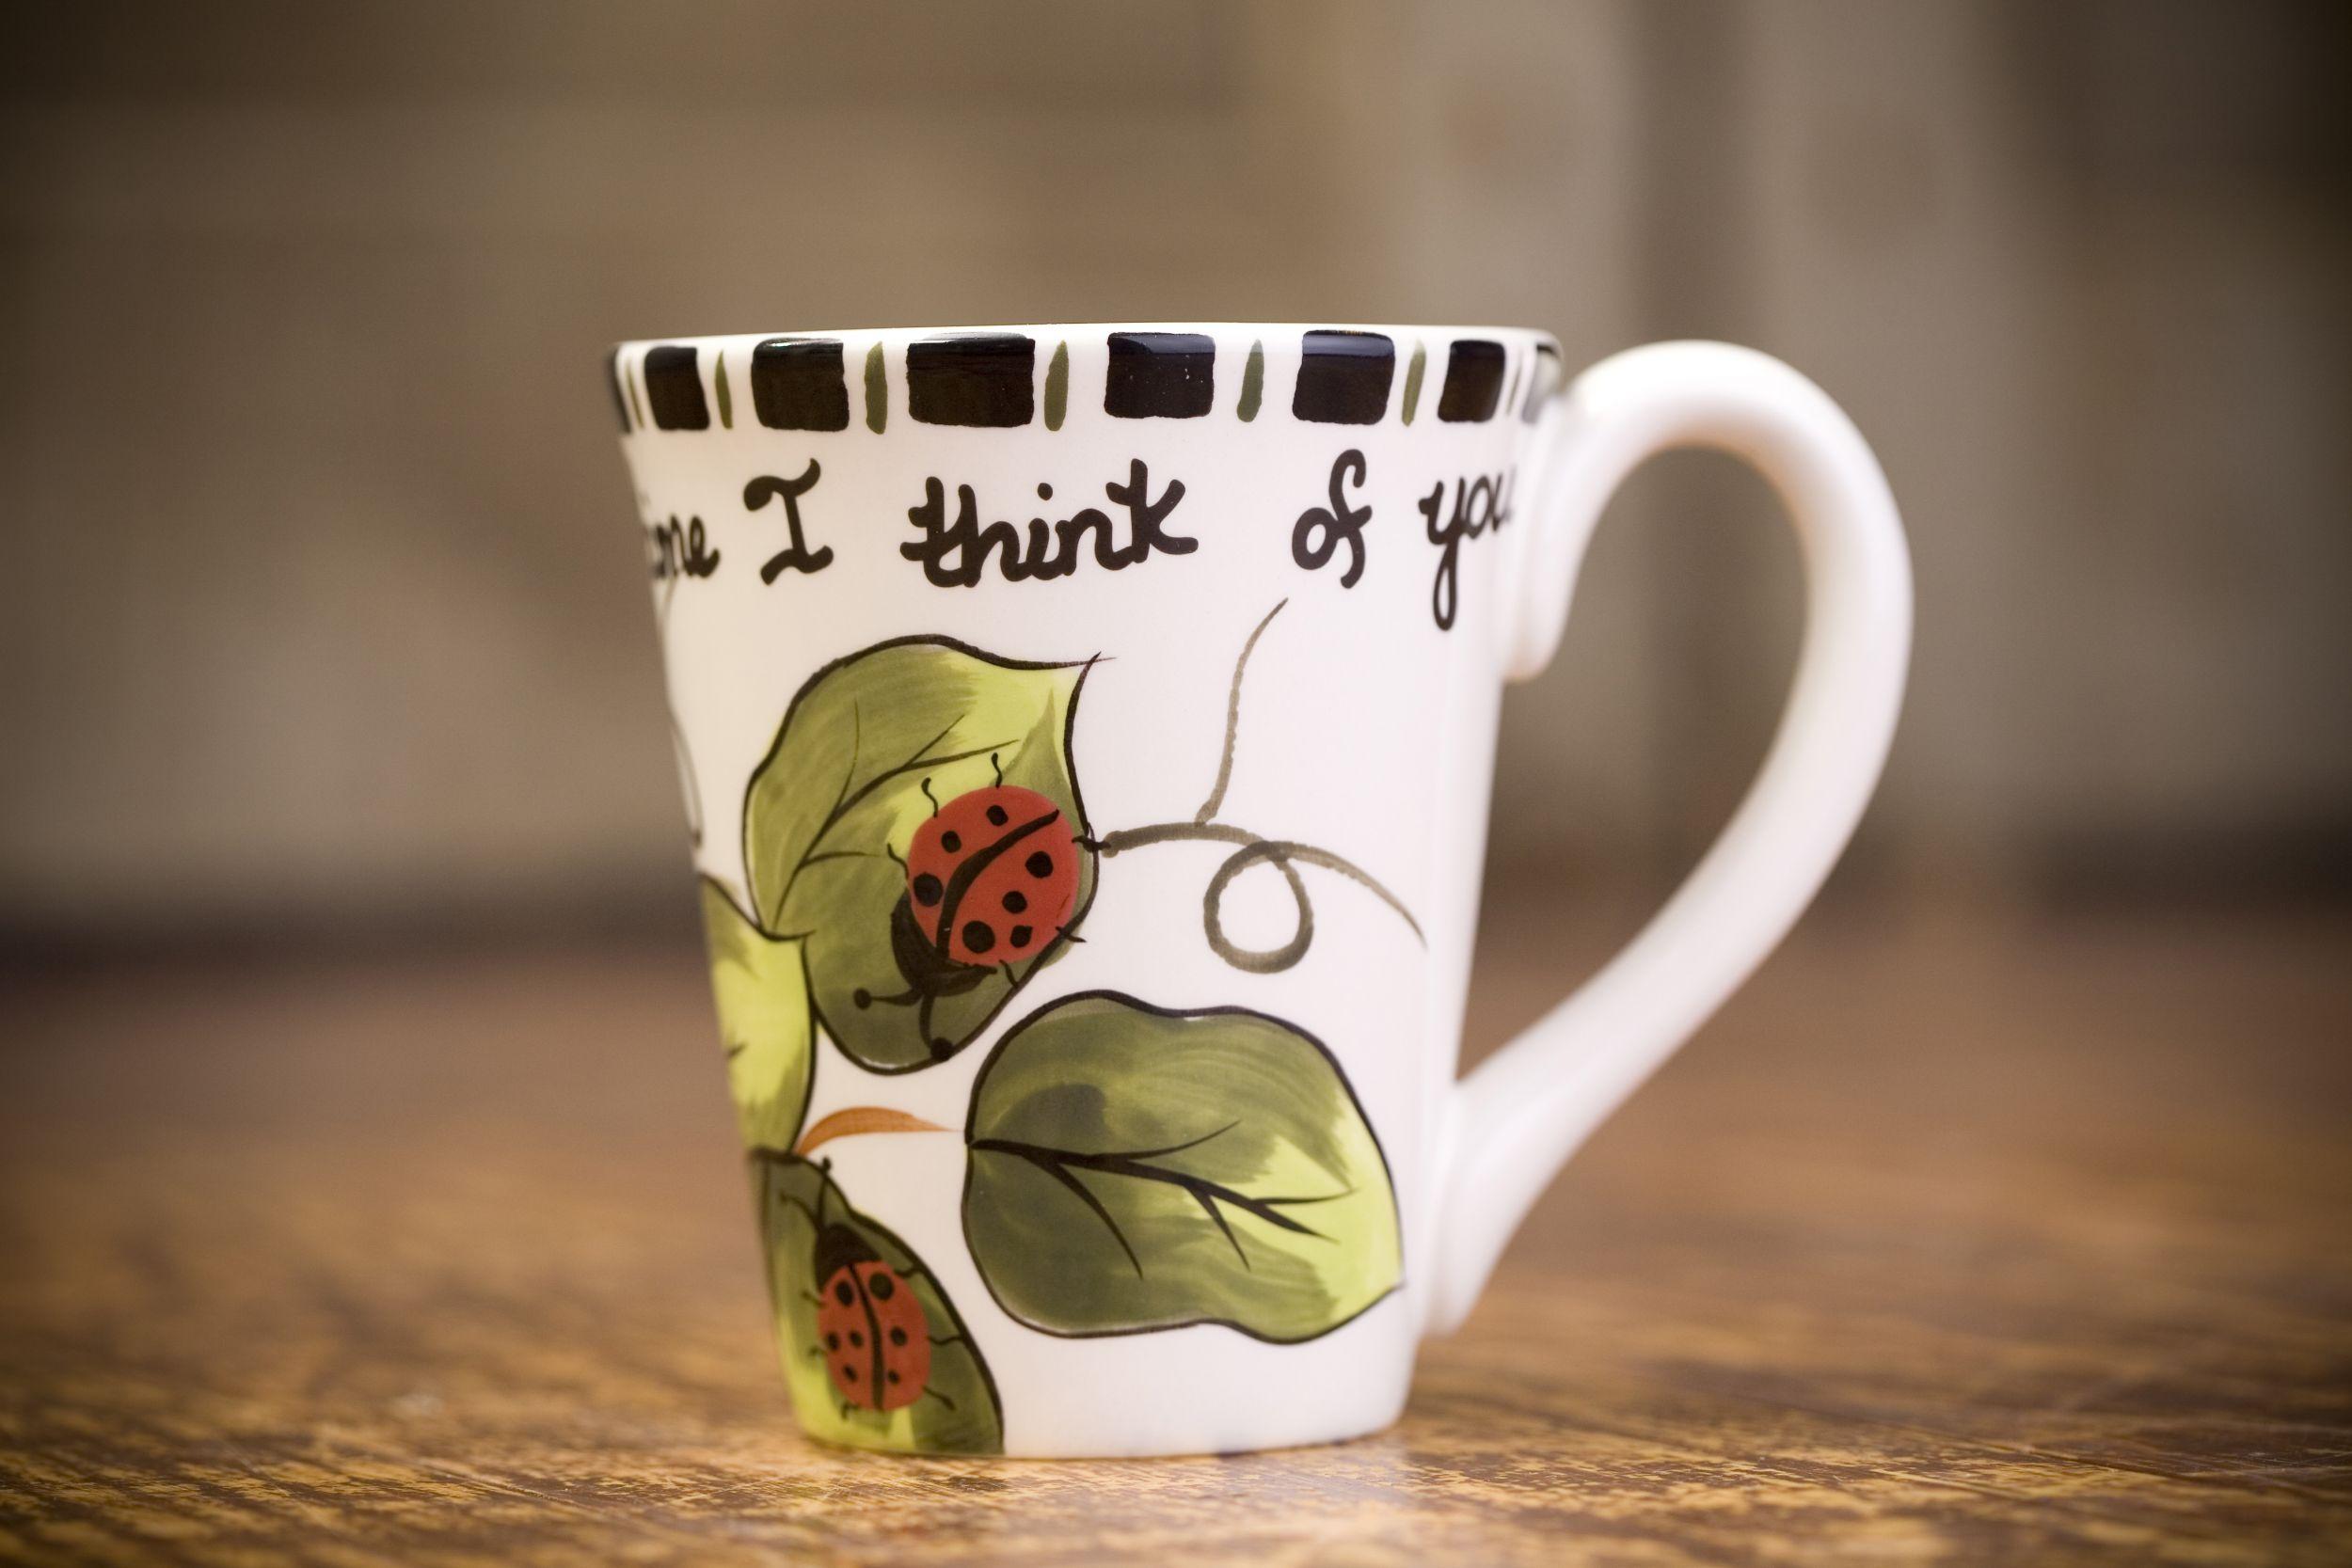 ladybug-mug-dayspring